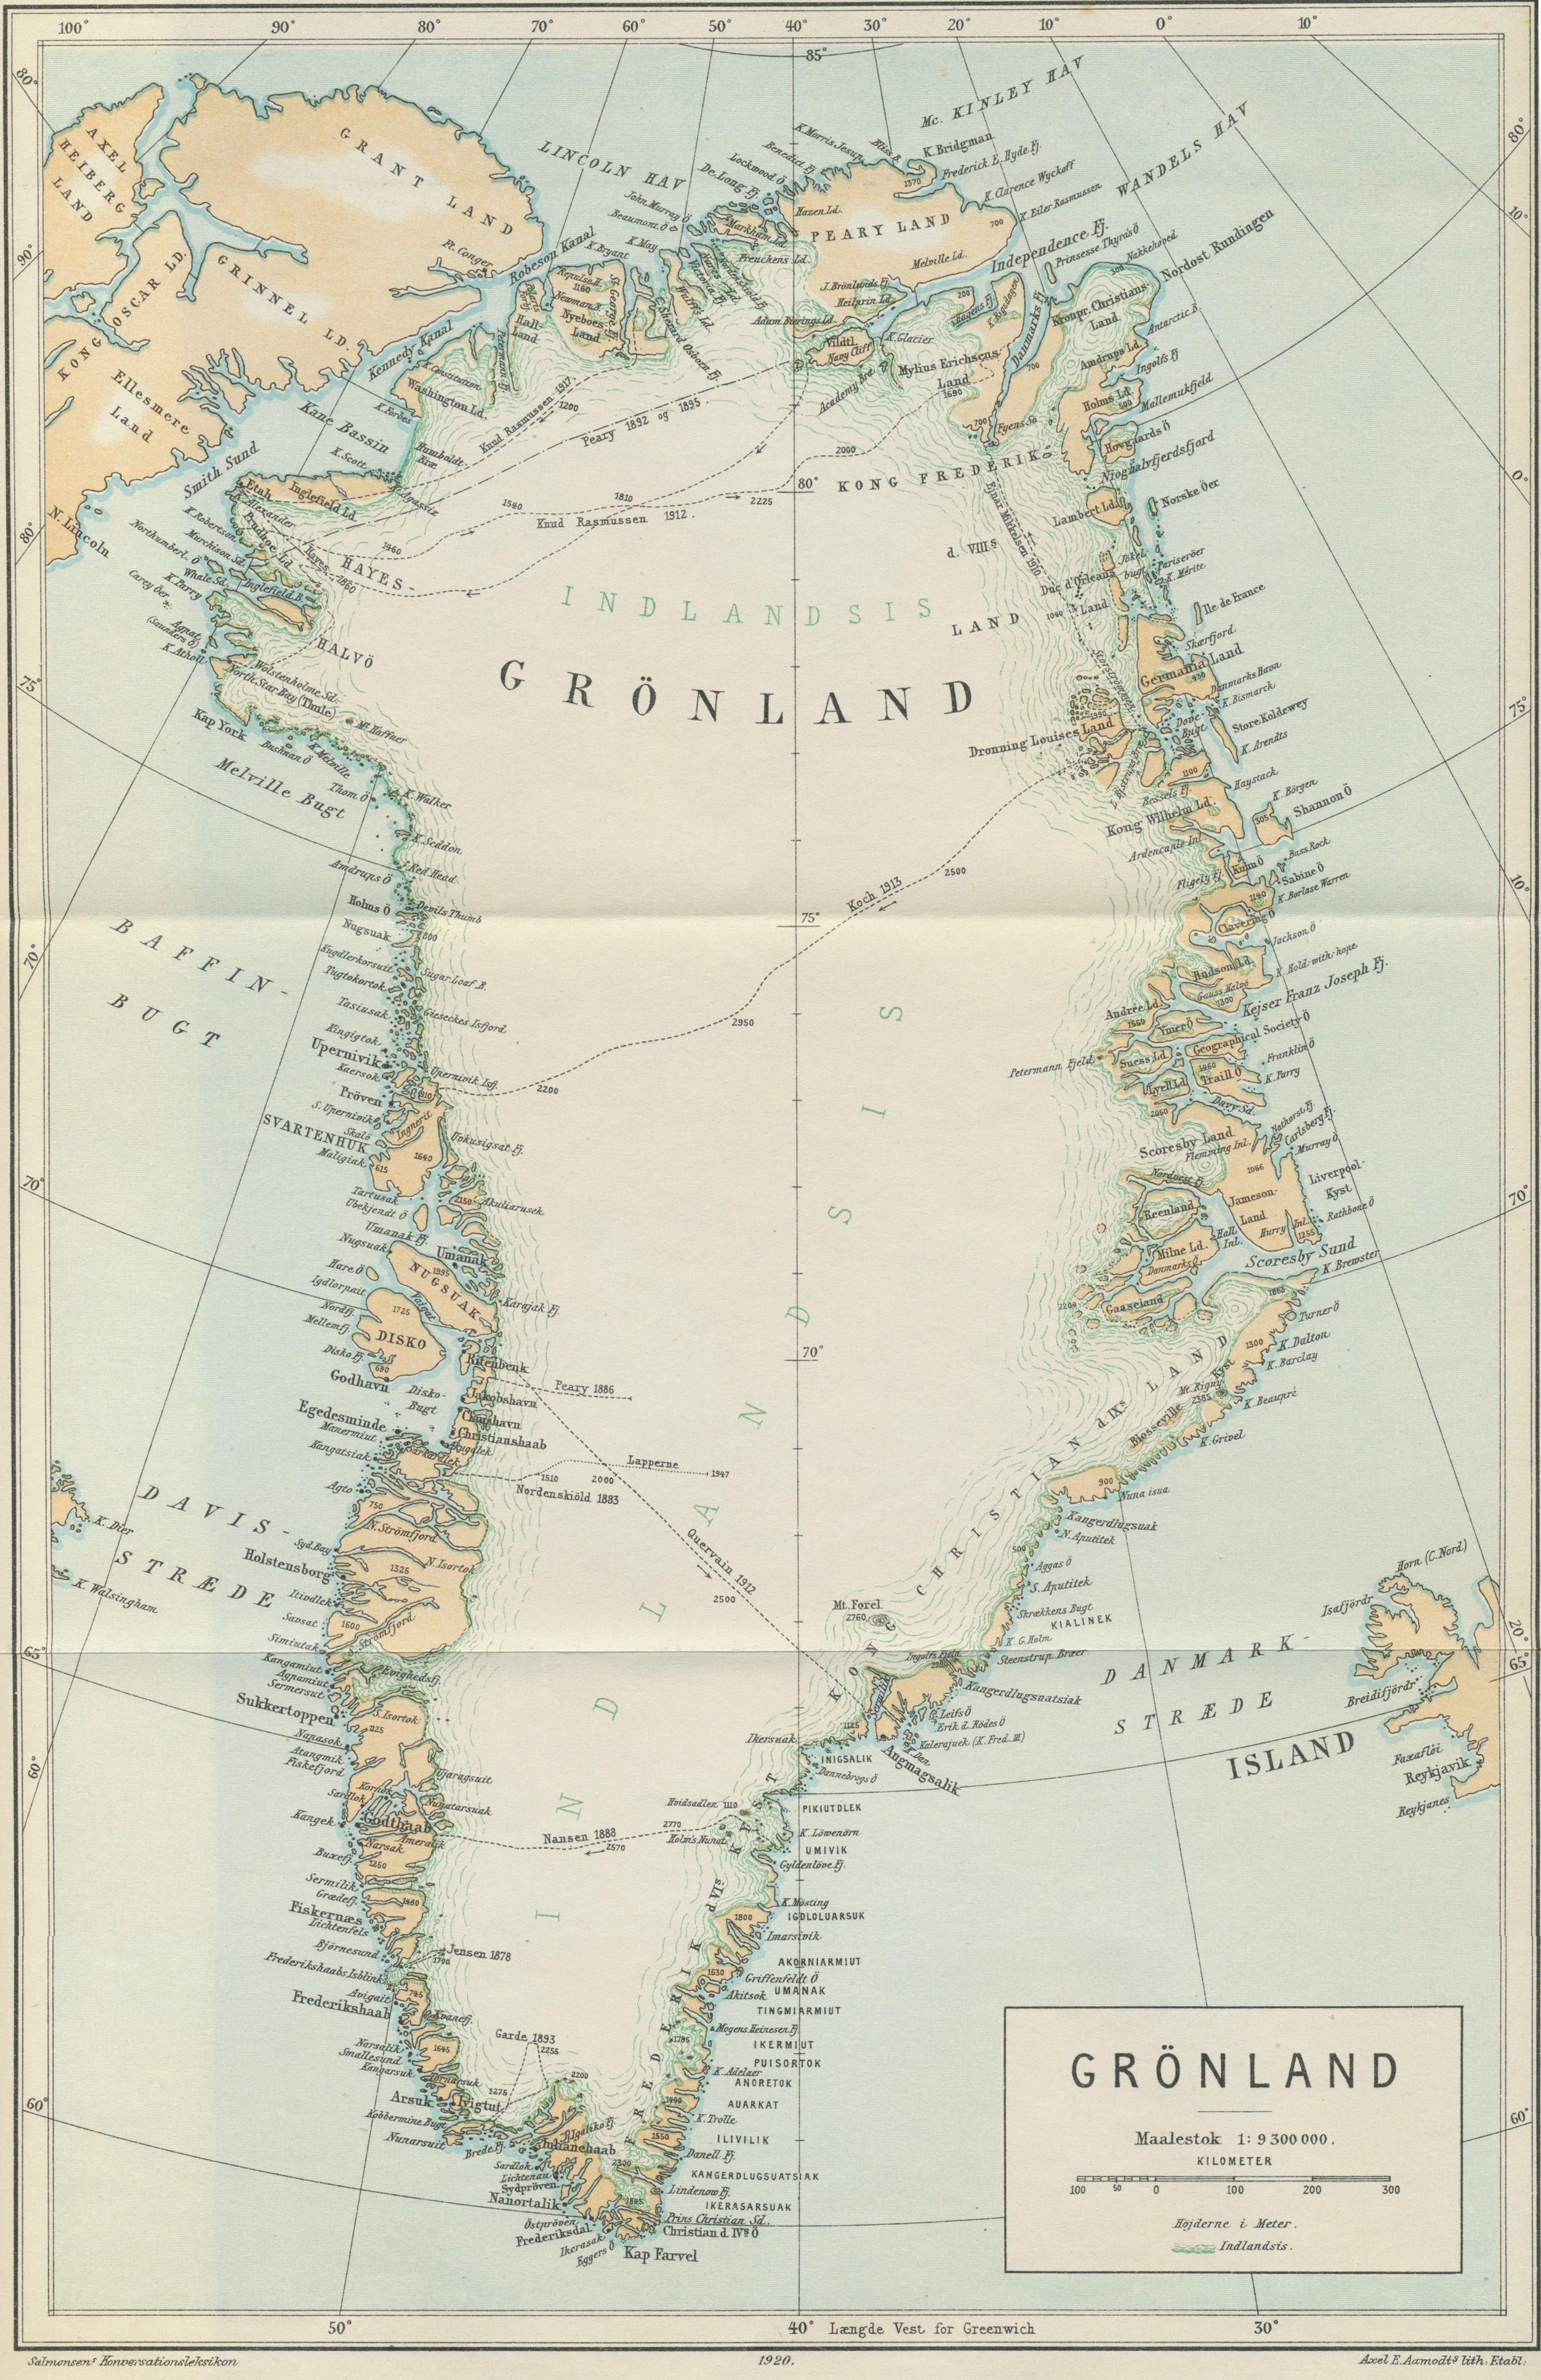 1920 Map of Greenland from Salmonsens Konversationsleksikon